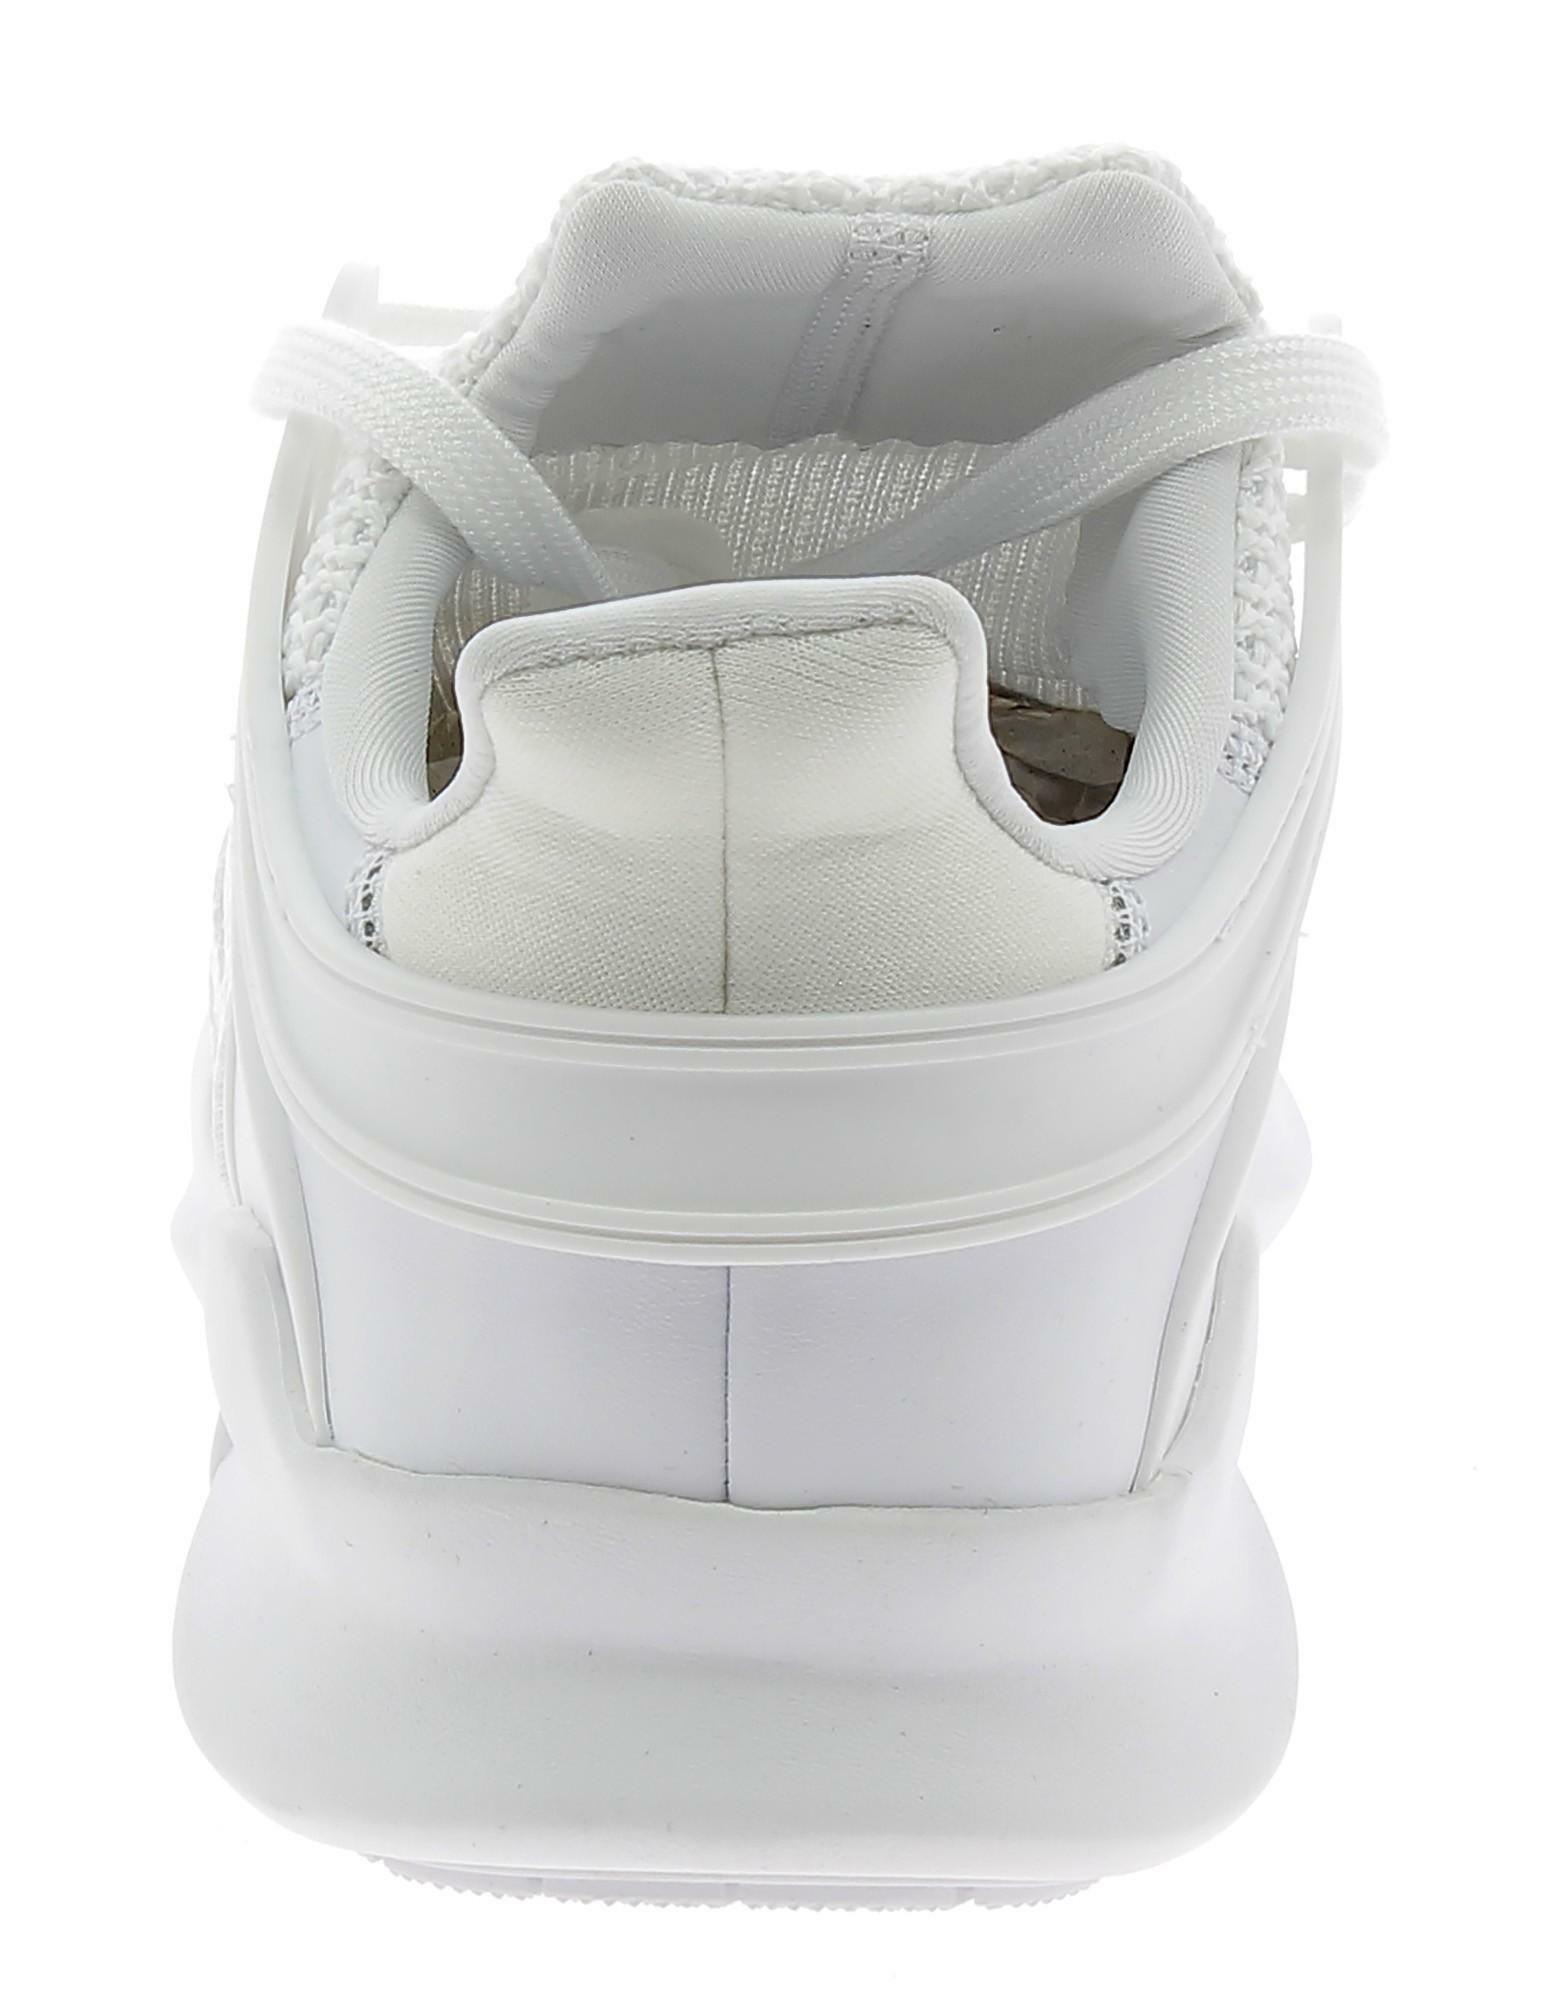 adidas adidas eqt support scarpe sportive uomo bianche d96770